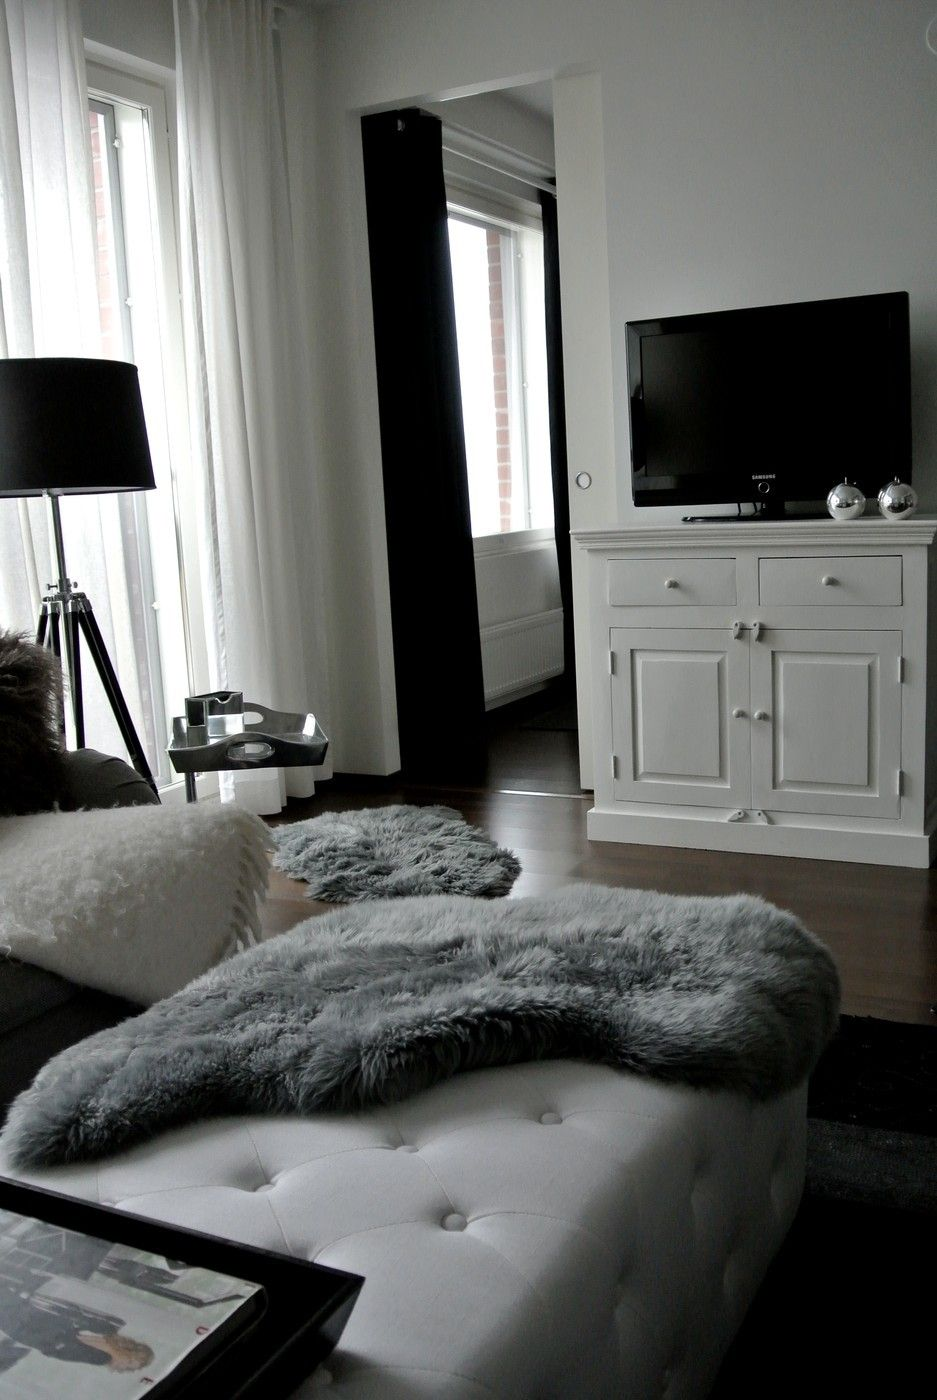 Fabulous Things - Blogi | Lily.fi